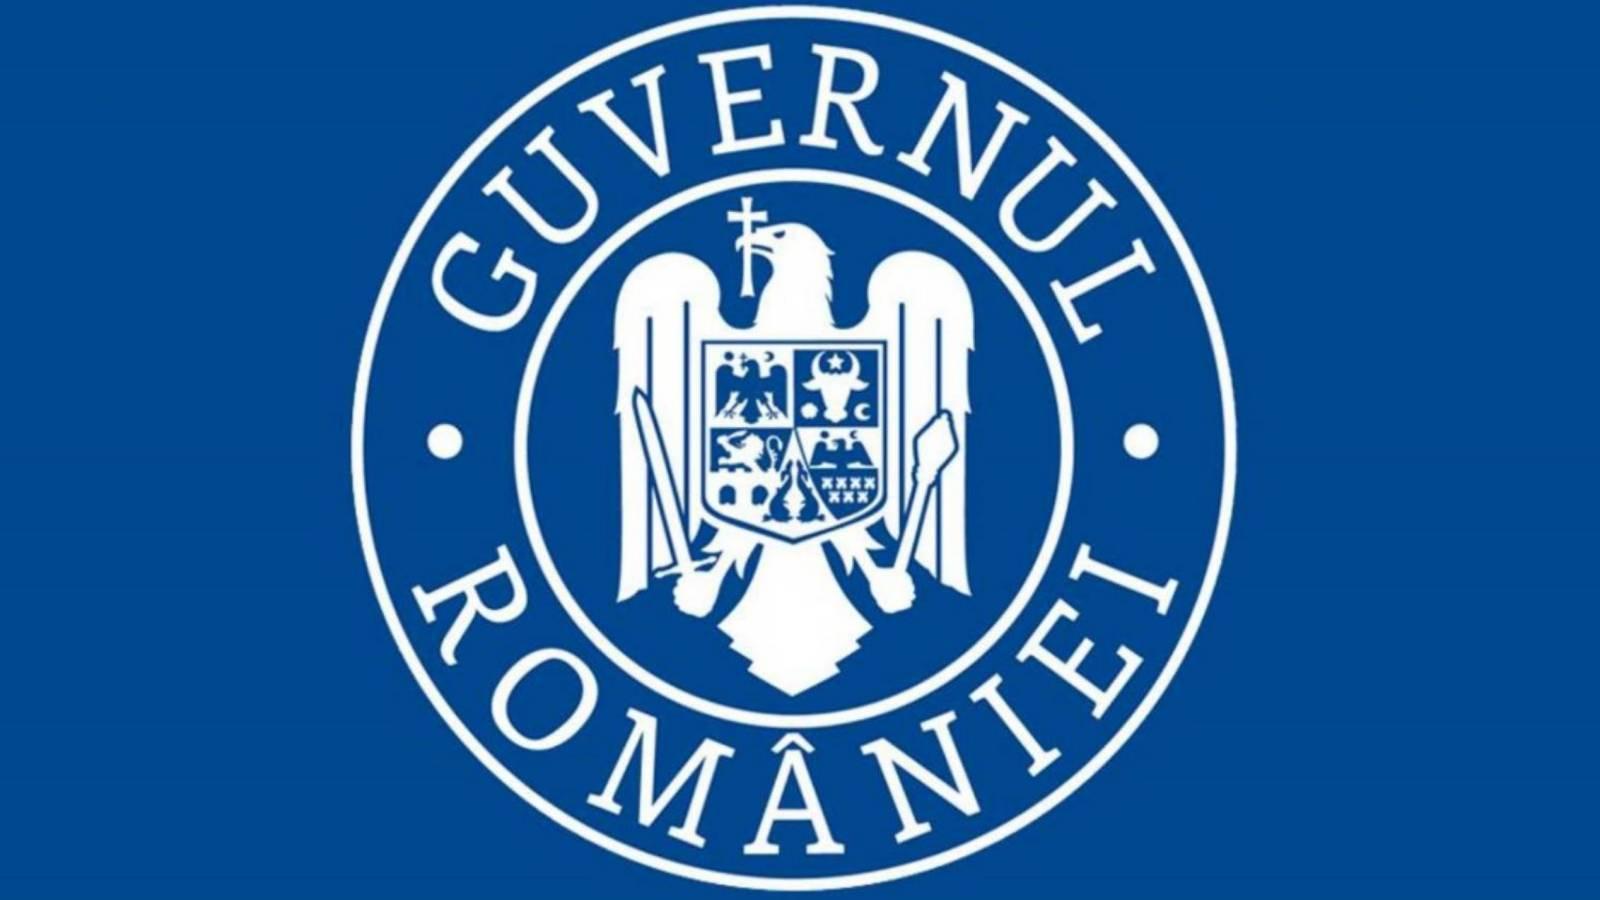 Guvernul Romaniei atentionare cumparaturi online